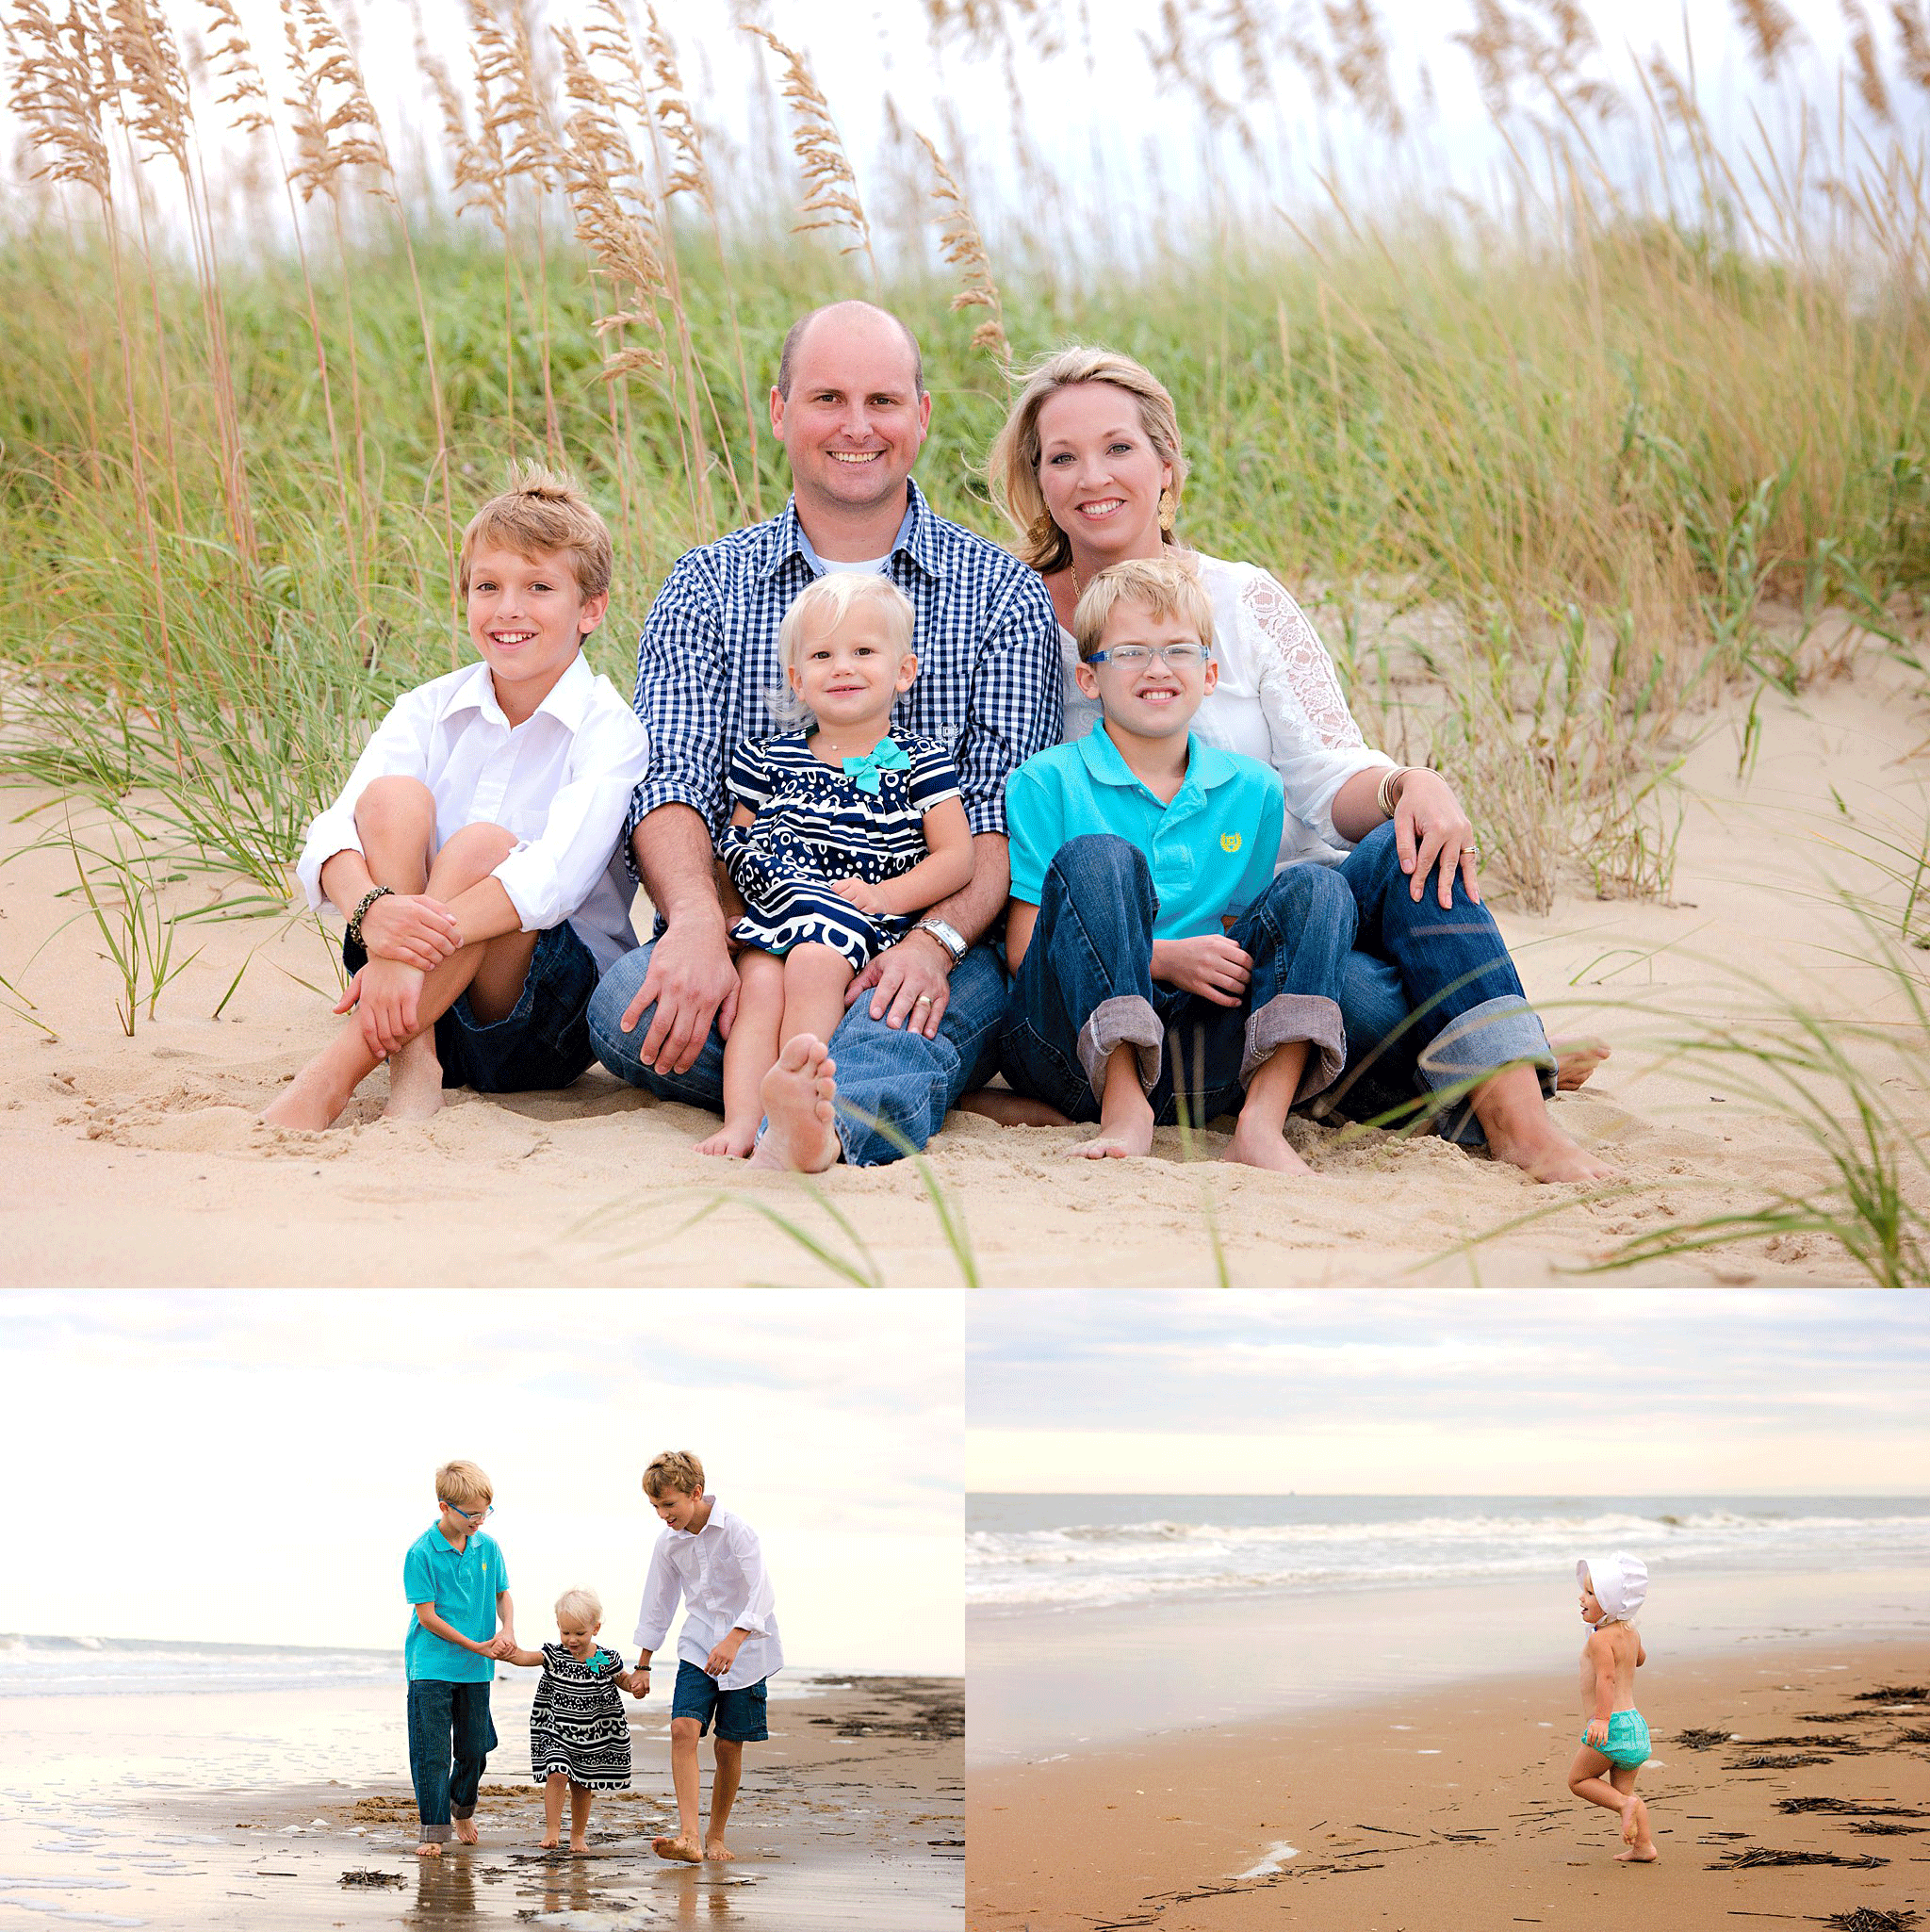 gorgeous-family-lifestyle-beach-photography-virginia-beach-photographers-melissa-bliss-photography-sandbridge-photographer.png